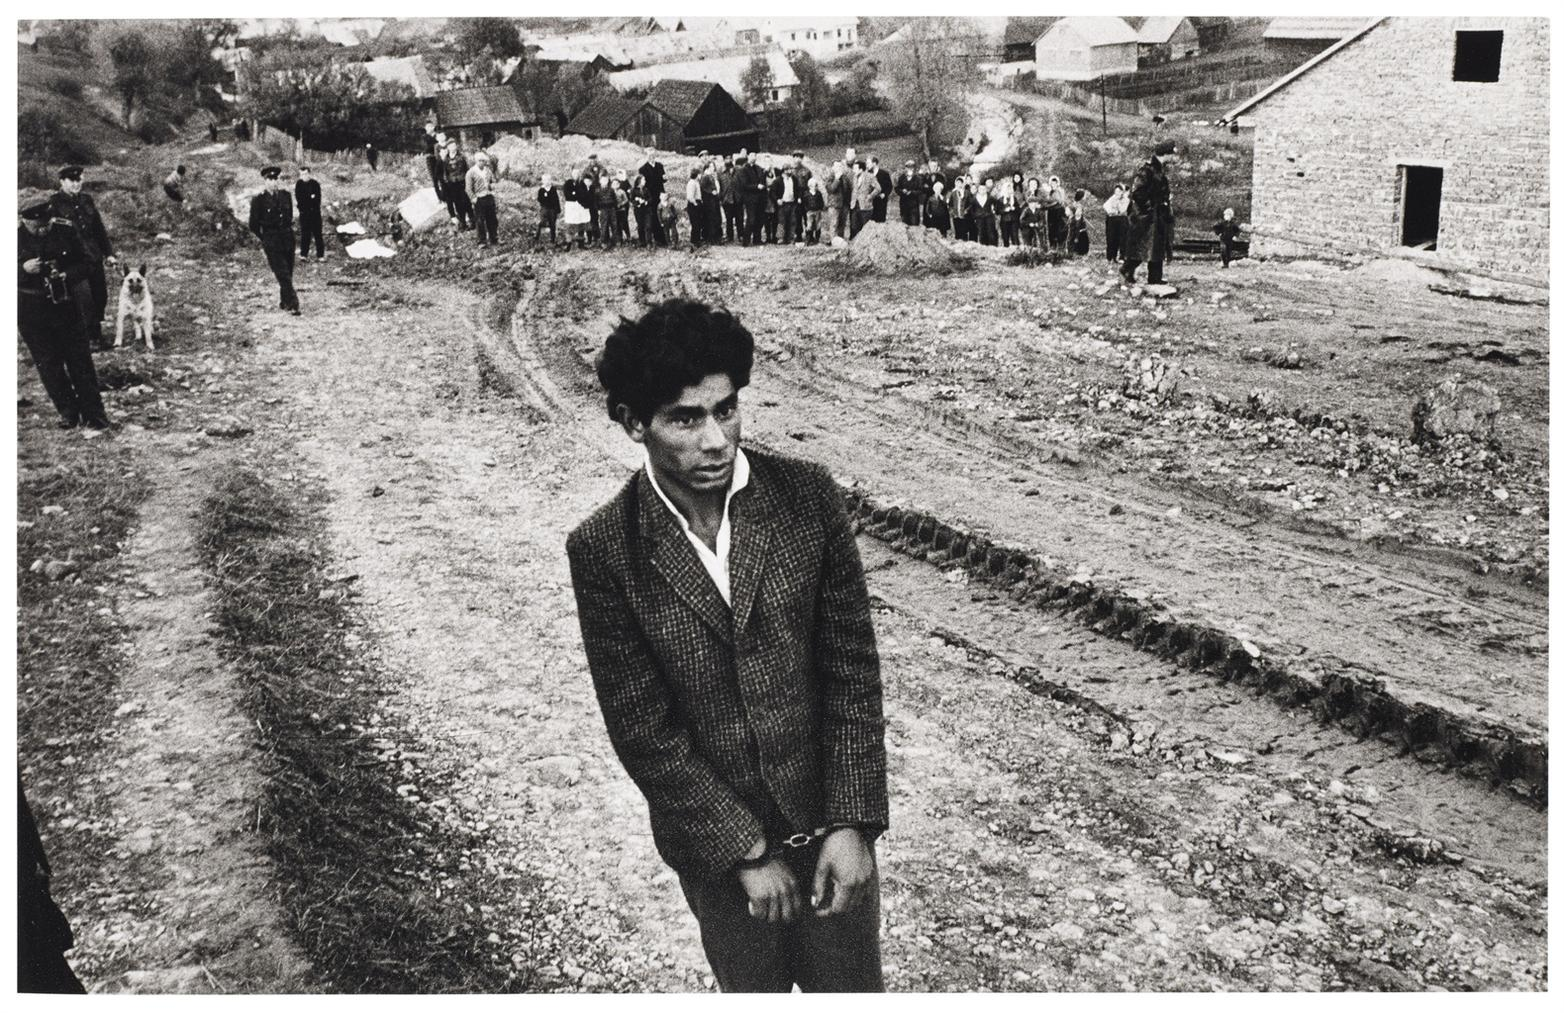 Josef Koudelka-Jarabina, Slovakia-1963